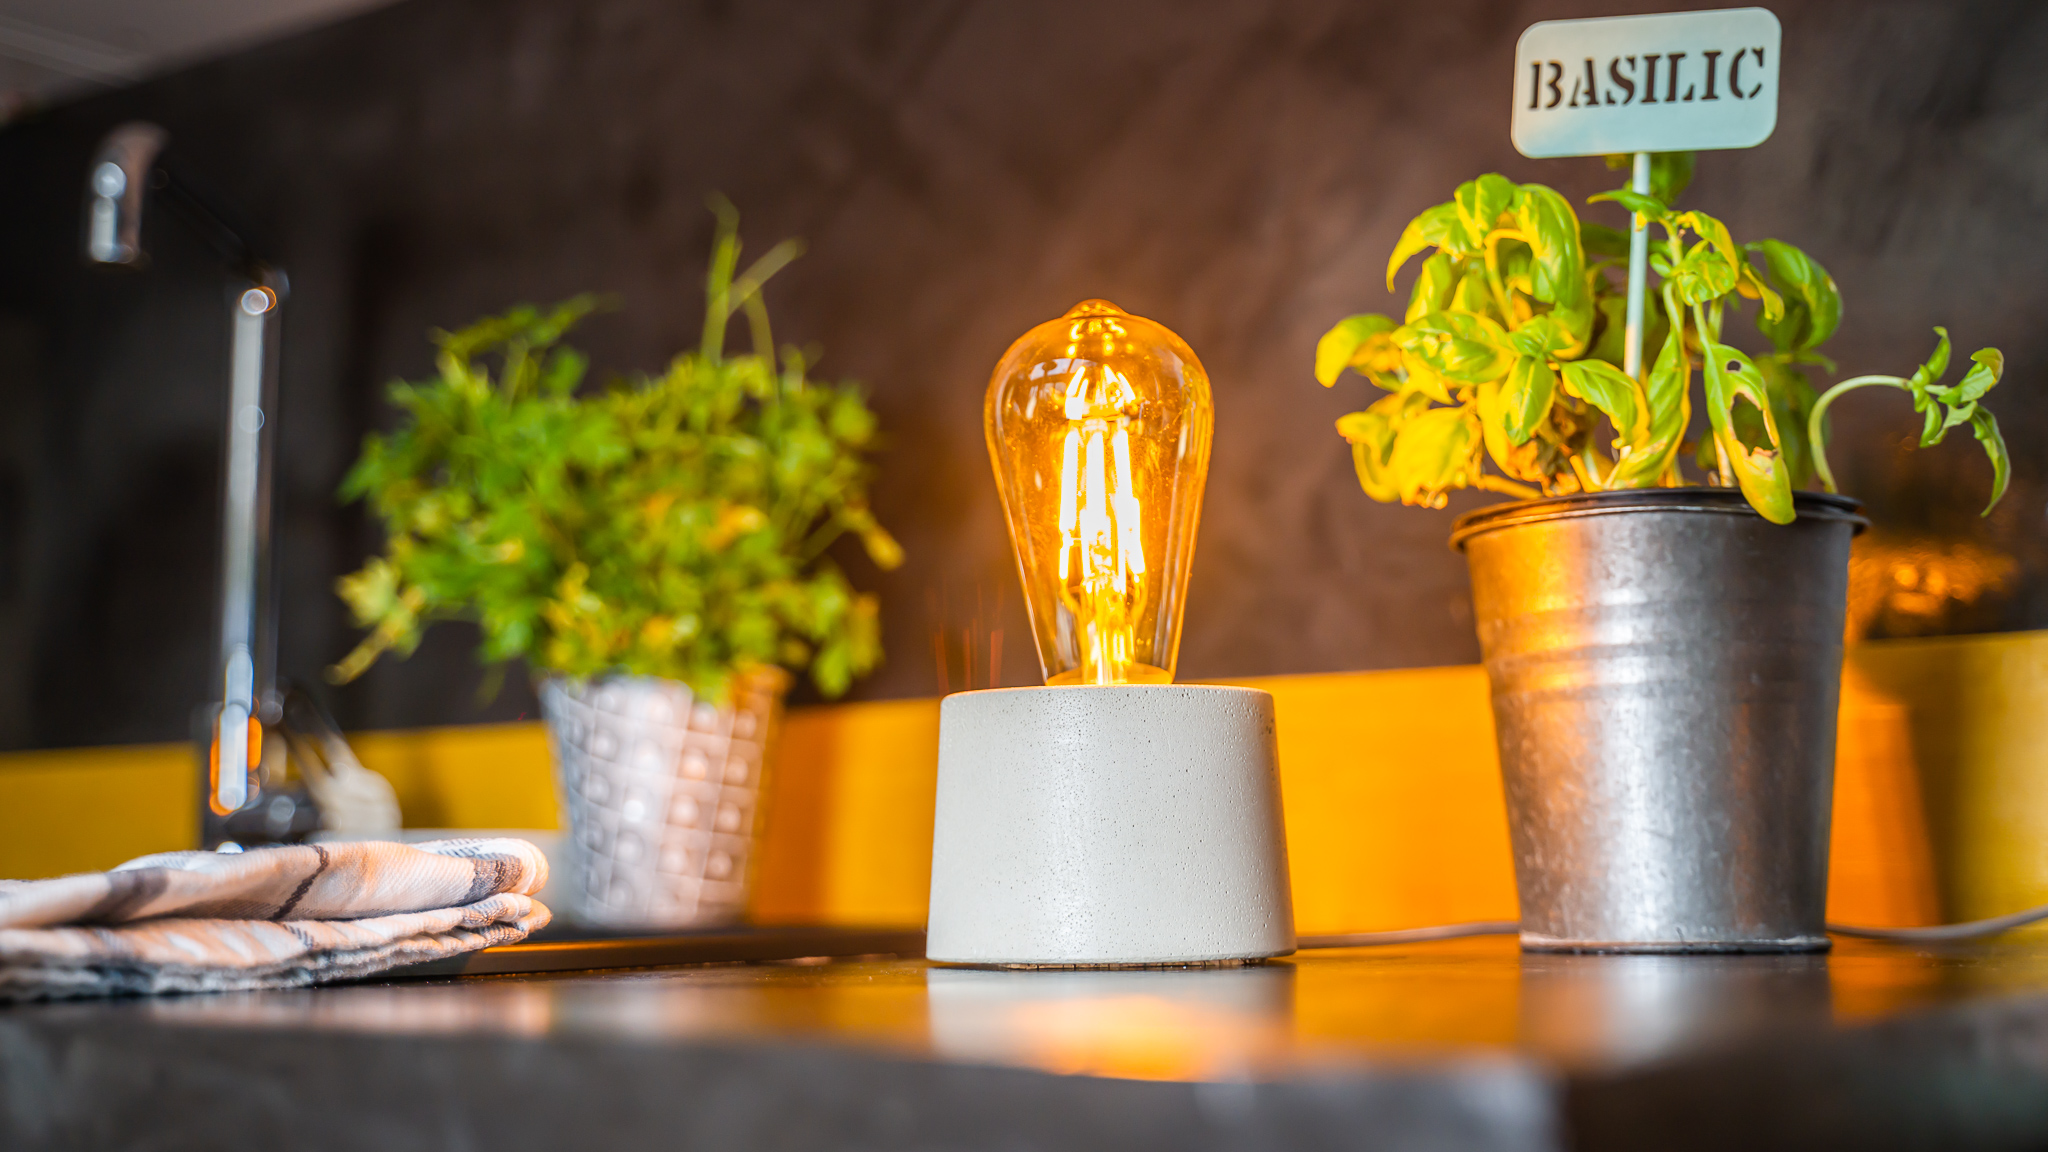 Lampe cylindrique en béton beige fabrication artisanale